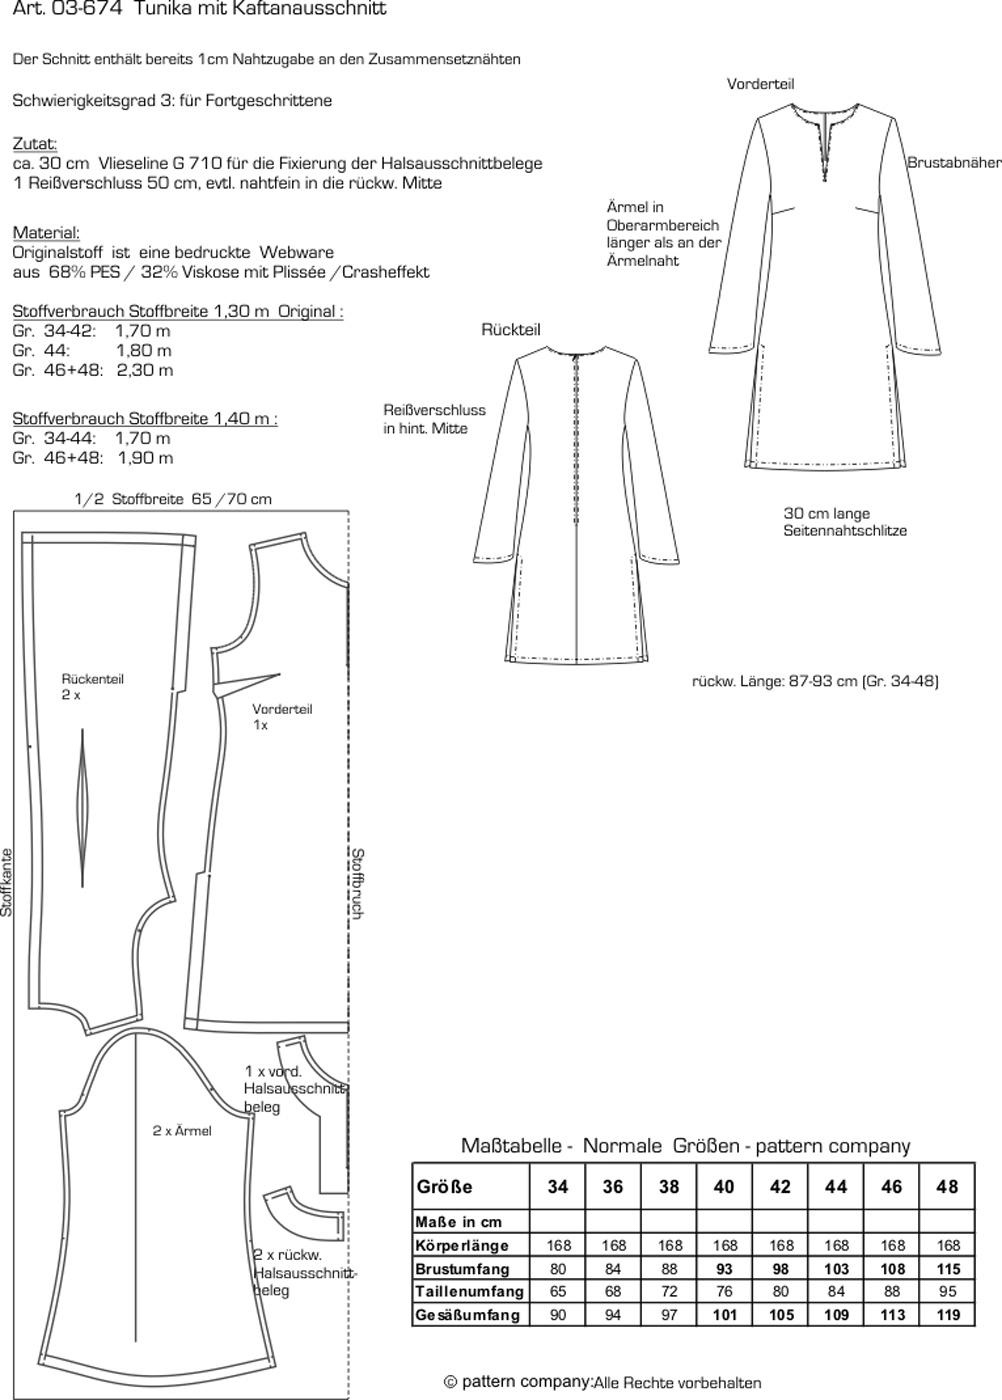 Schnittmuster - Tunika mit Kaftanausschnitt - 03-674 - Pattern Company